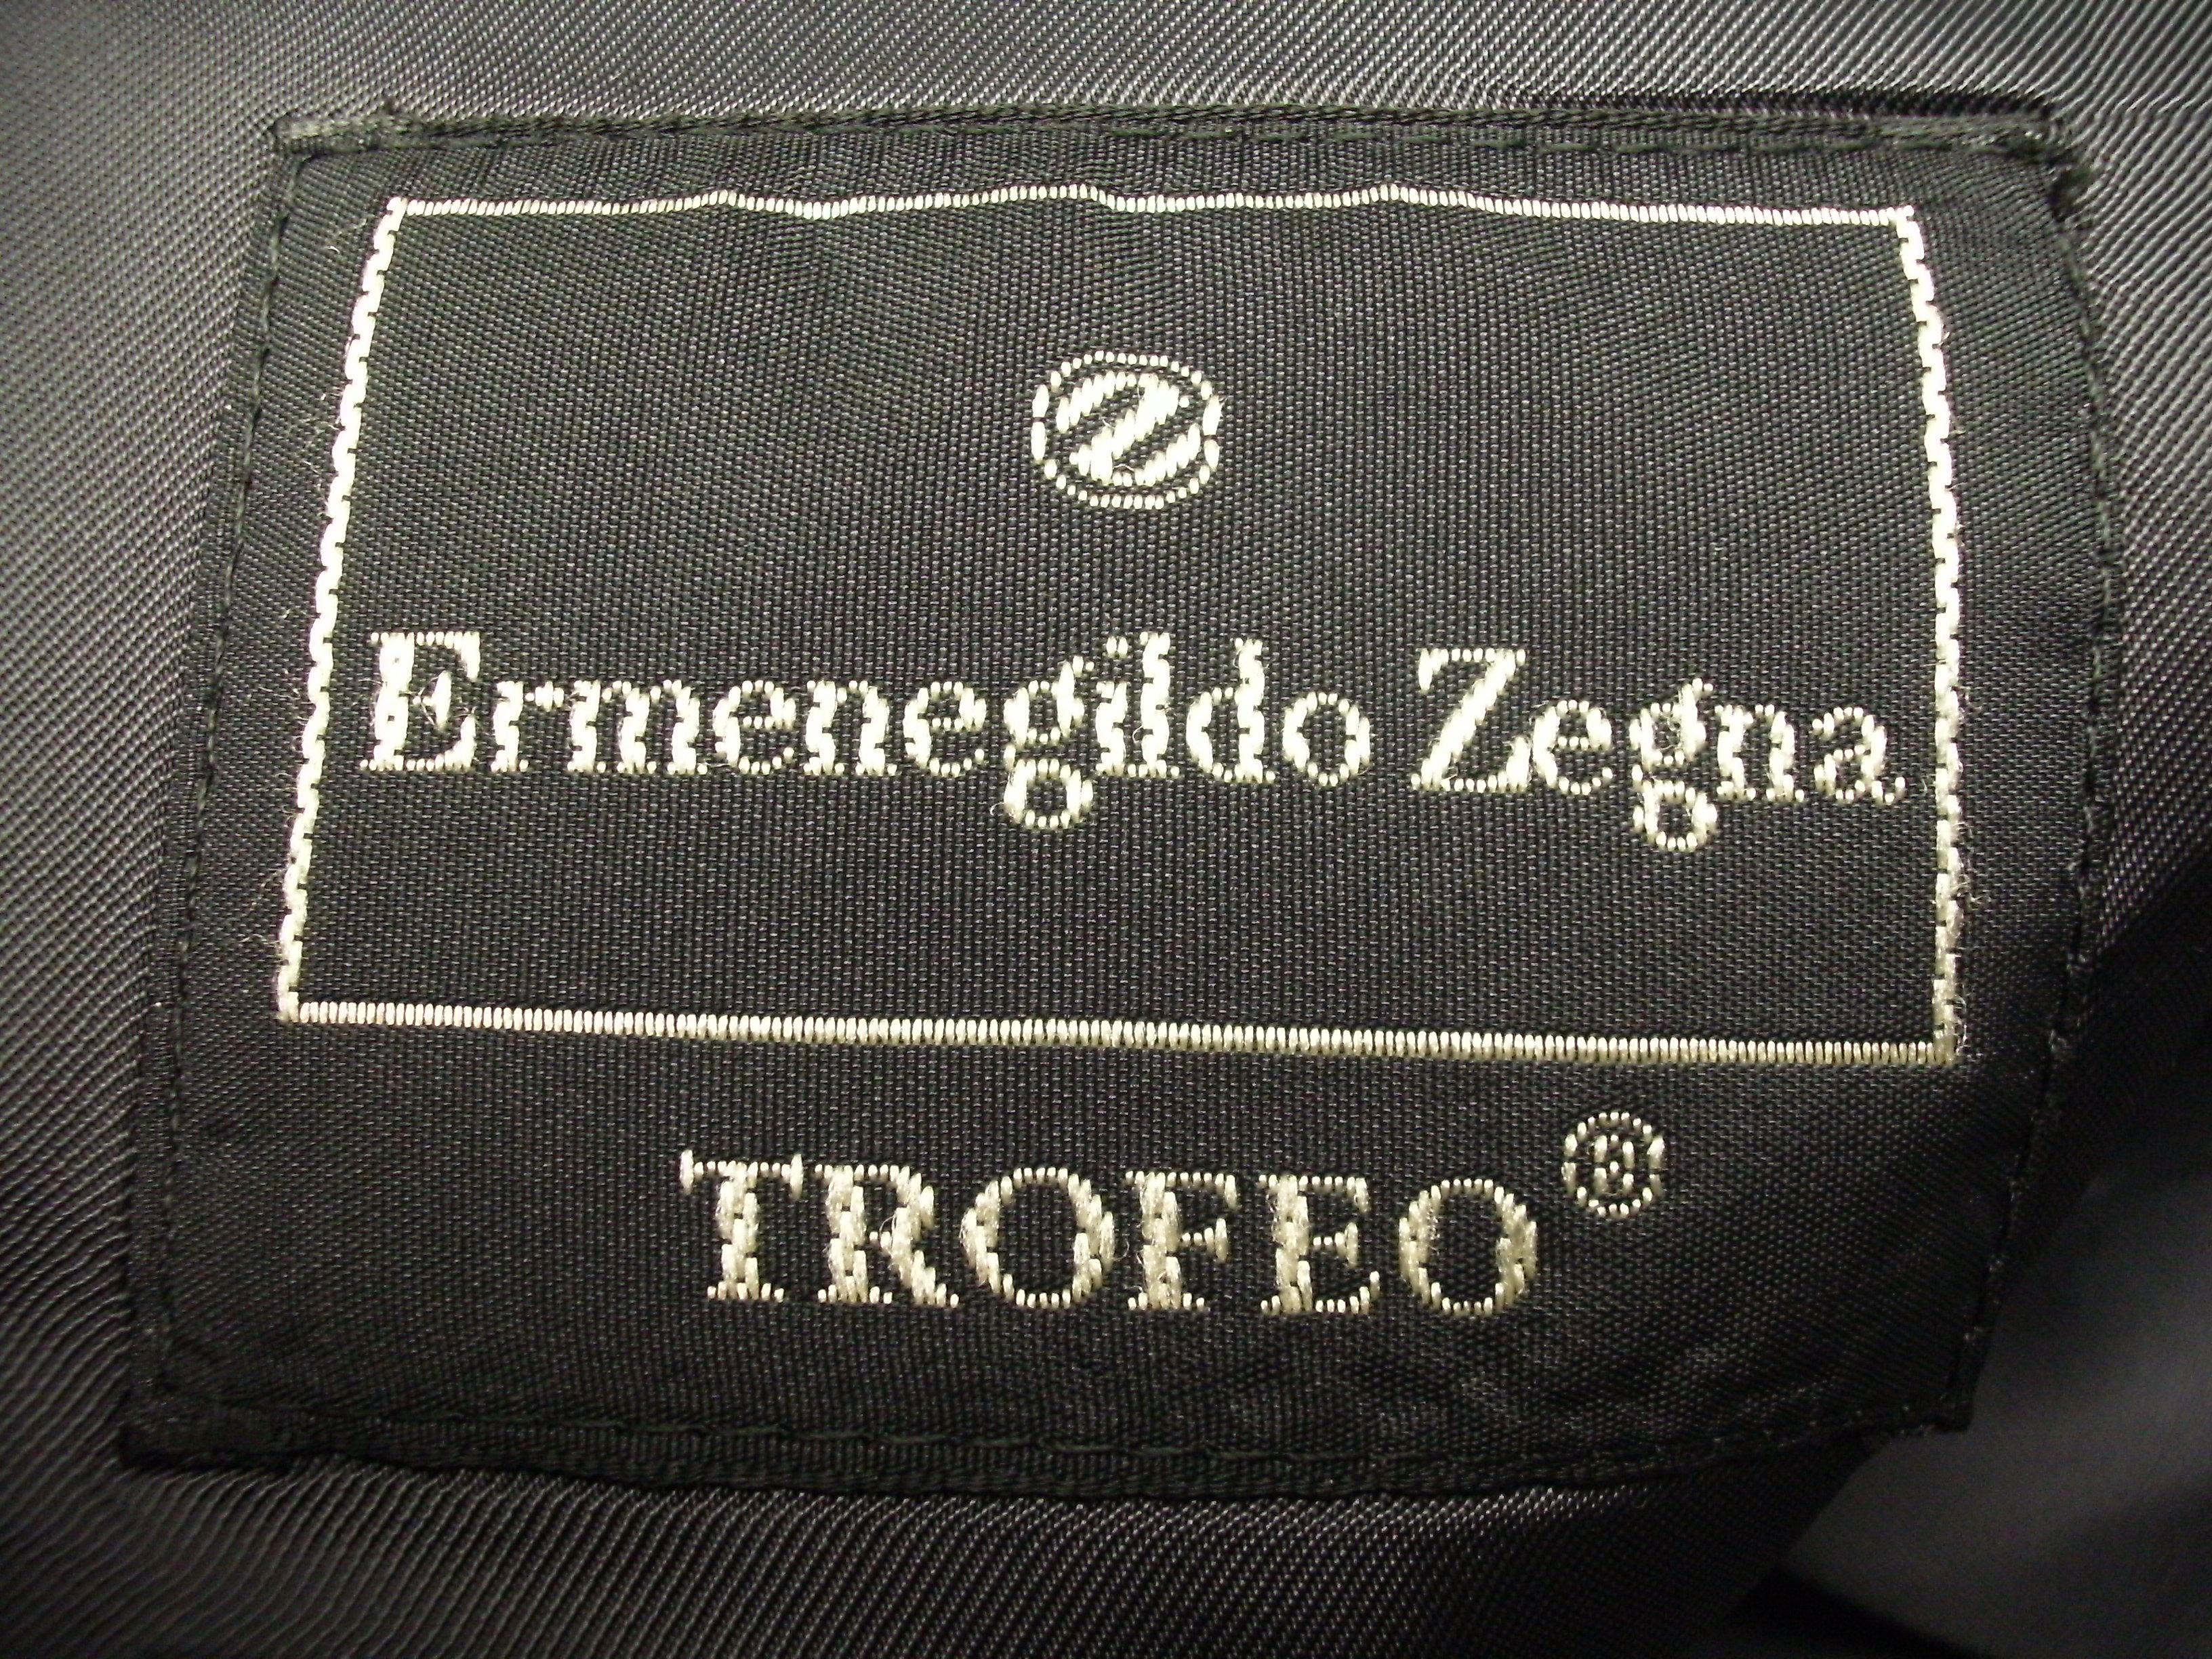 Zegna (11).JPG